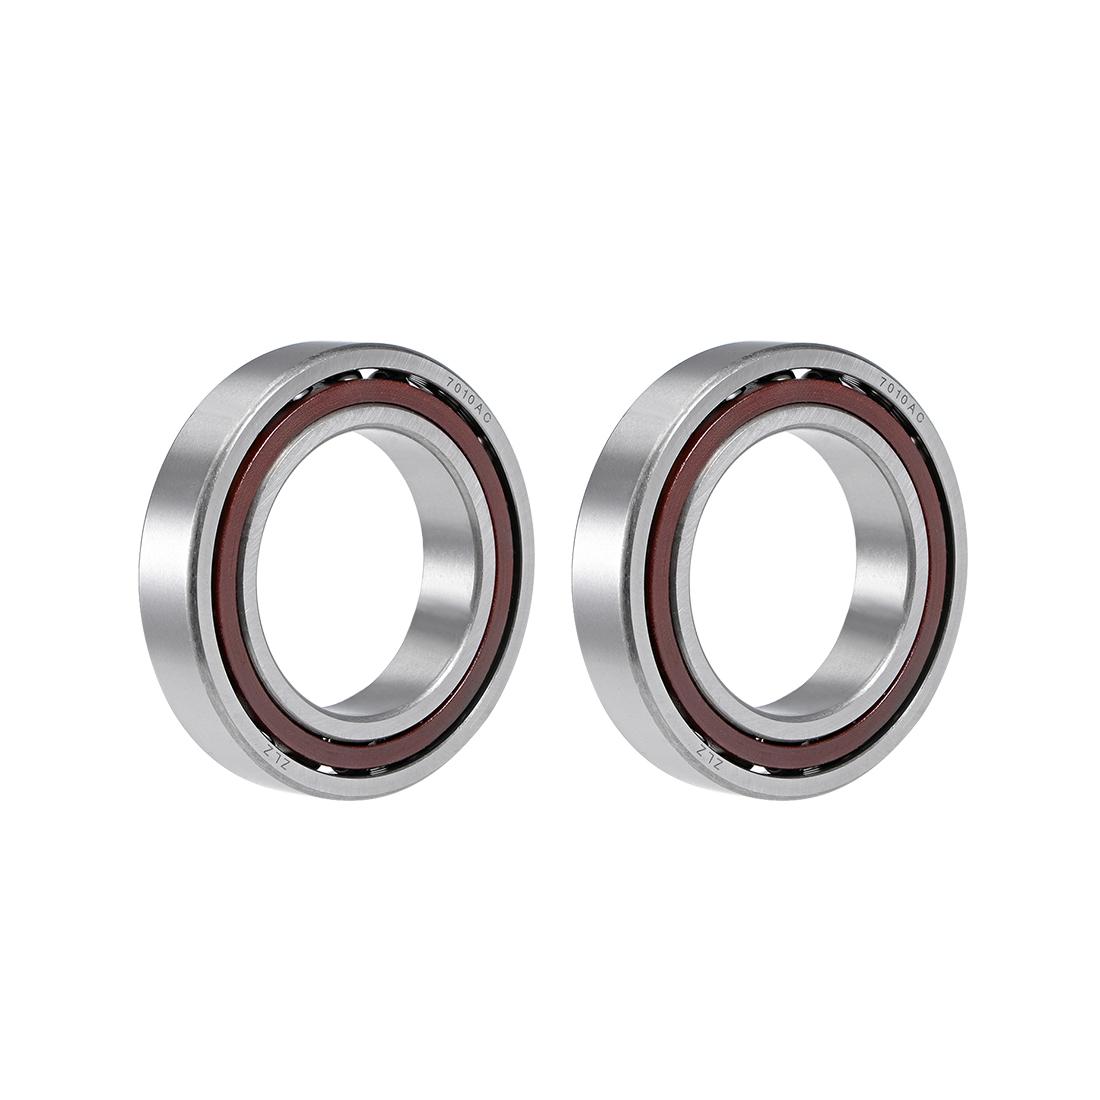 7010AC Angular Contact Ball Bearing 50x80x16mm, Single Row, Open Type 2pcs